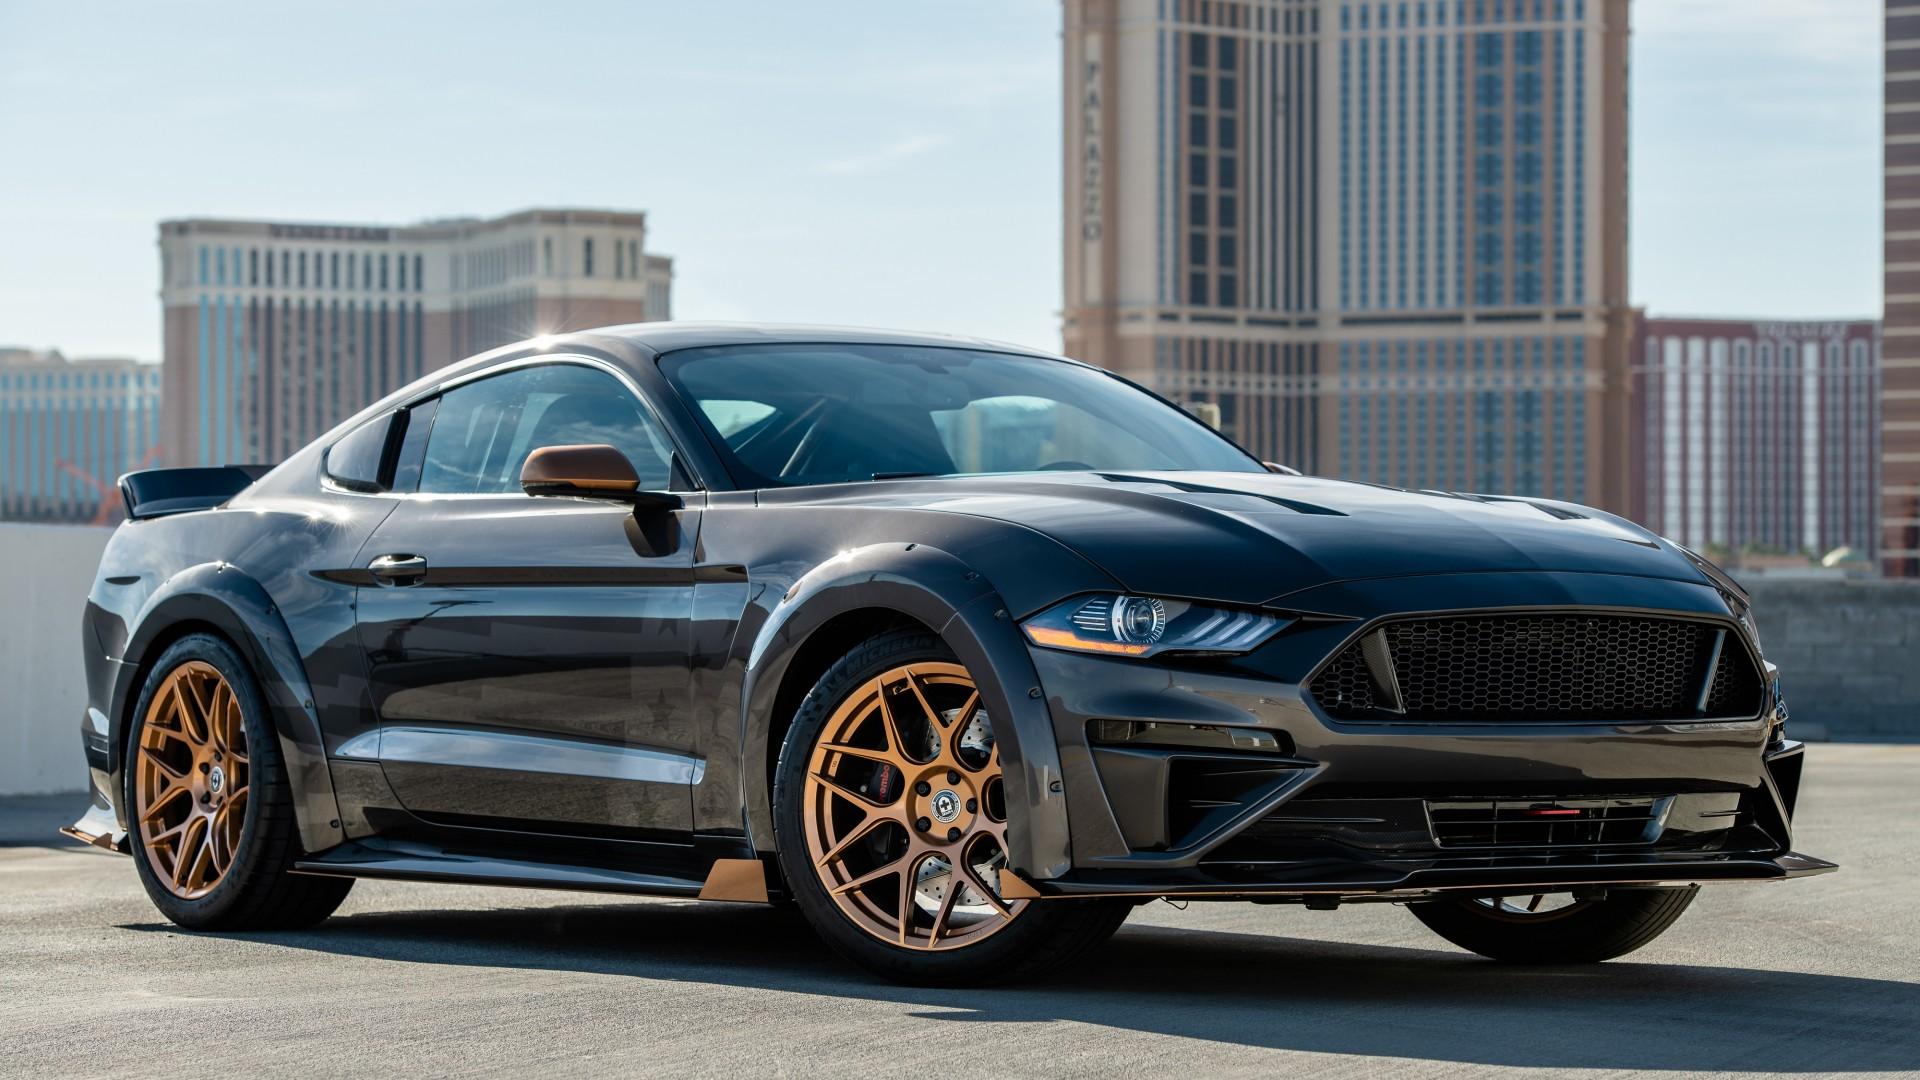 04 Mustang Gt >> CJ Pony Parts Ford Mustang GT 2018 4K Wallpaper | HD Car ...